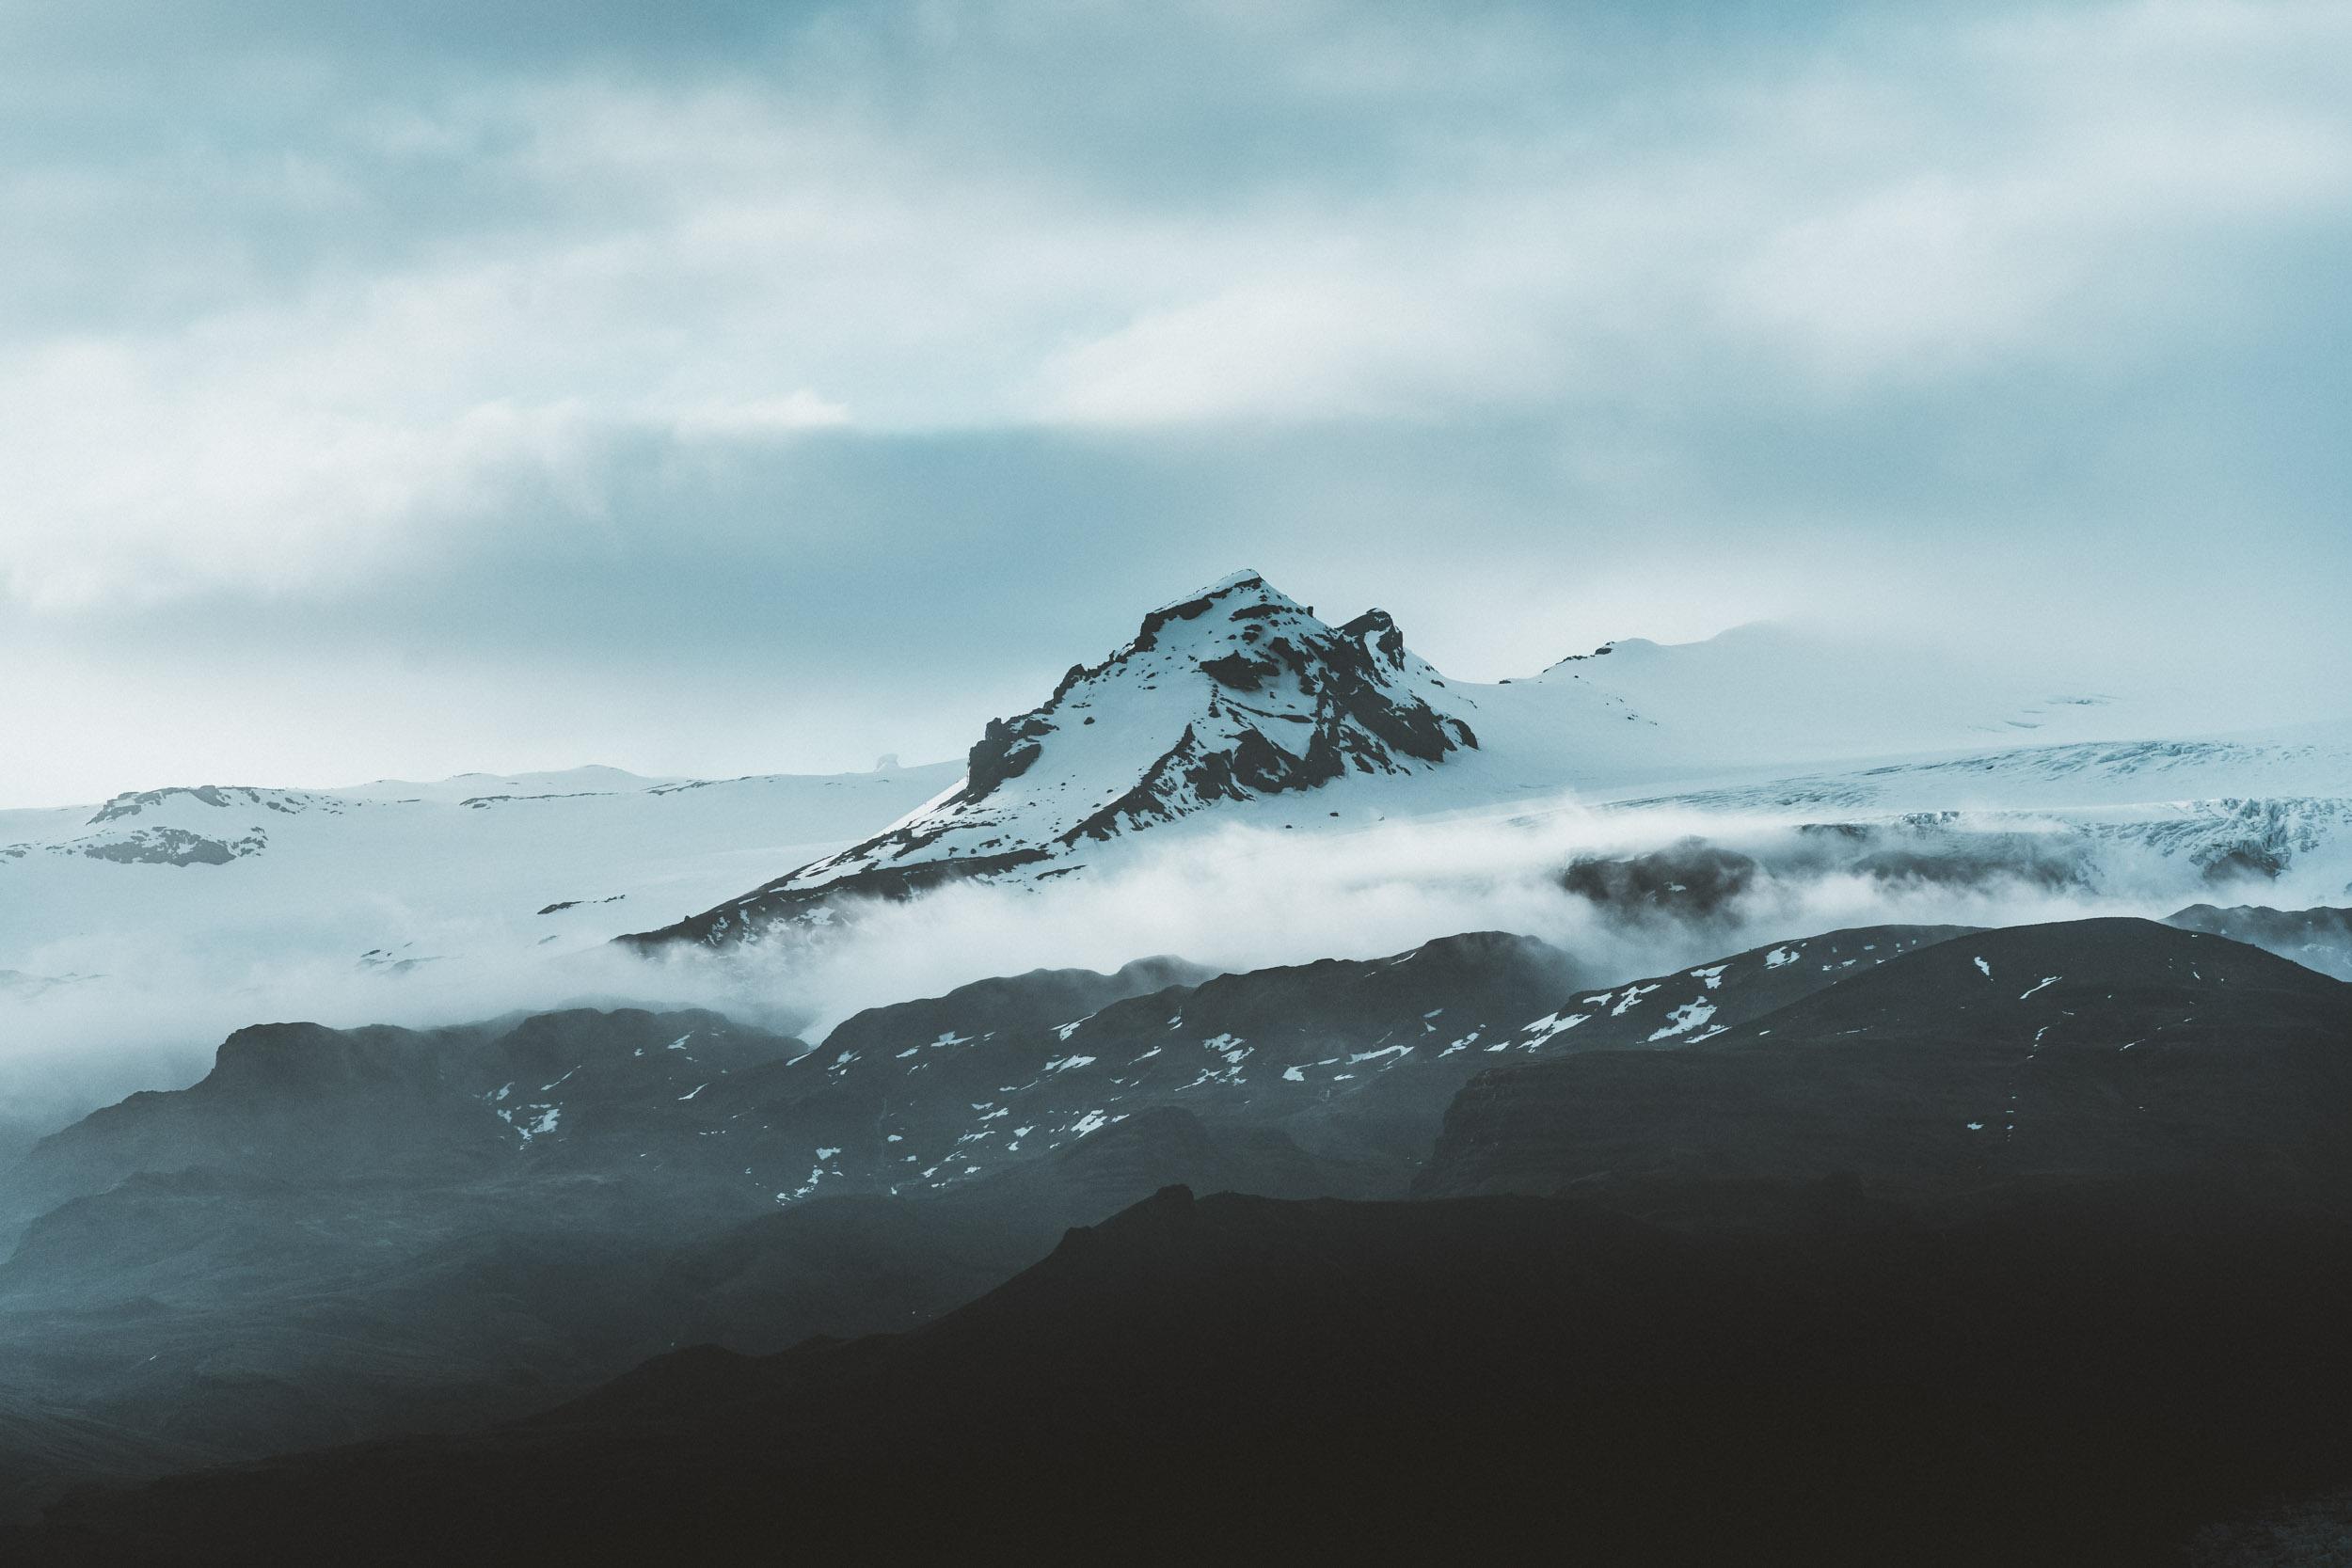 Iceland_Nov2018_ByTomKahler_Lowres (78 of 193).jpg